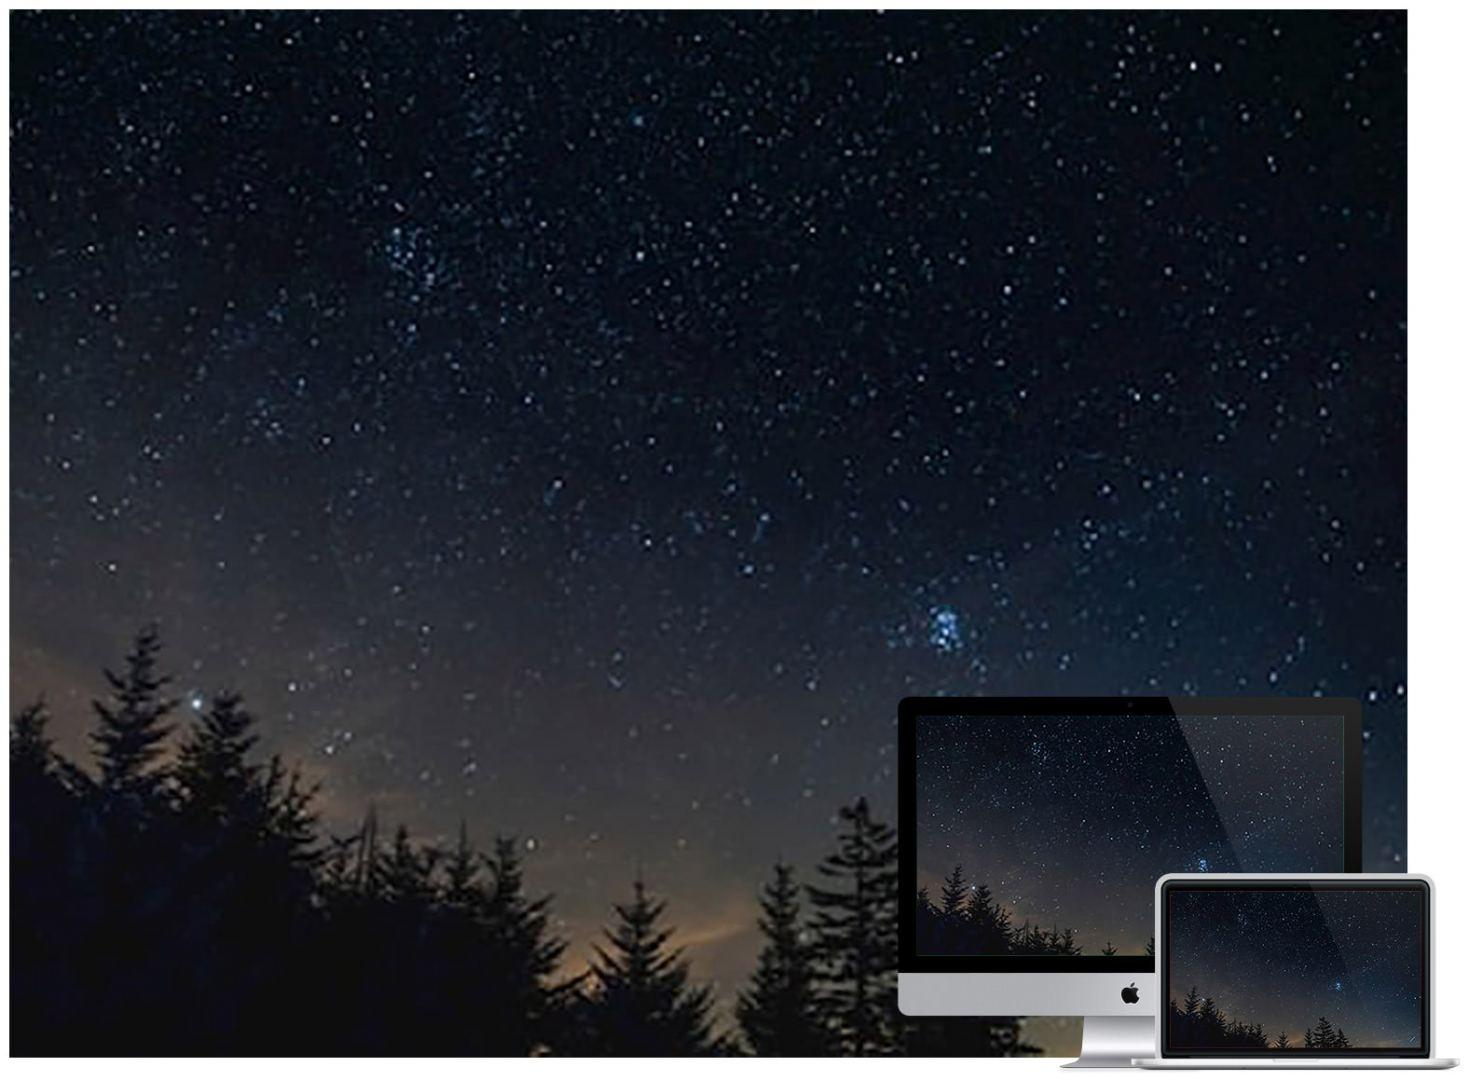 starry-sky-night-trees-wallpaper